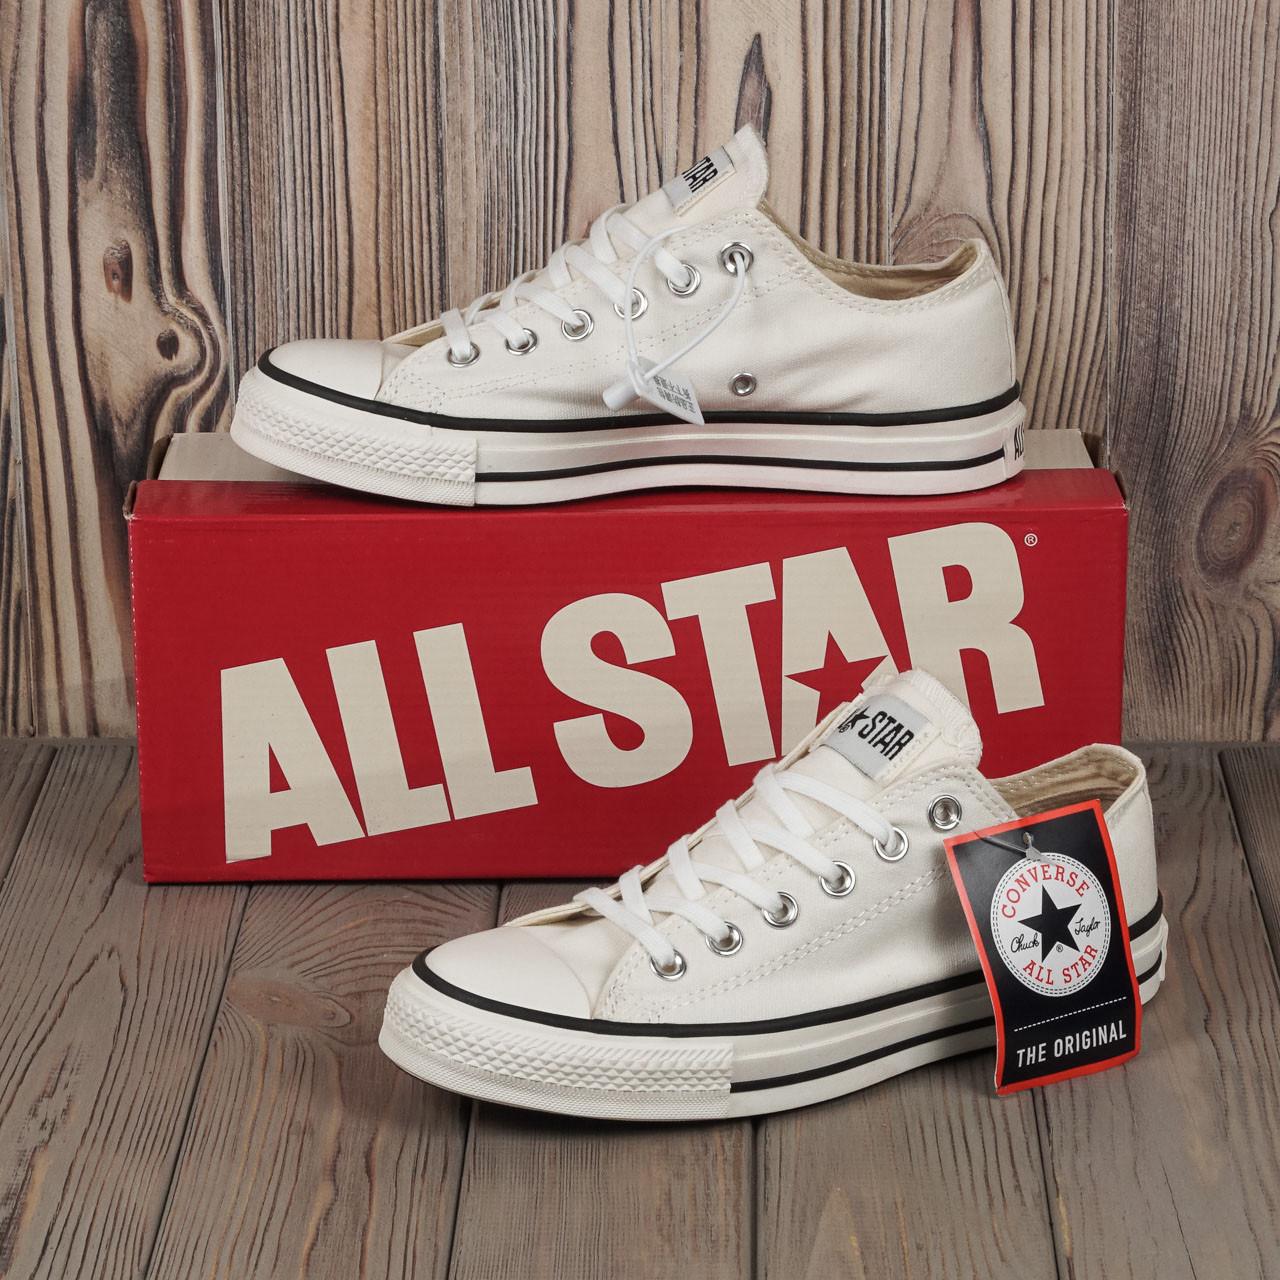 Кеды Converse All Star 80s Style (Белые низкие) Все размеры